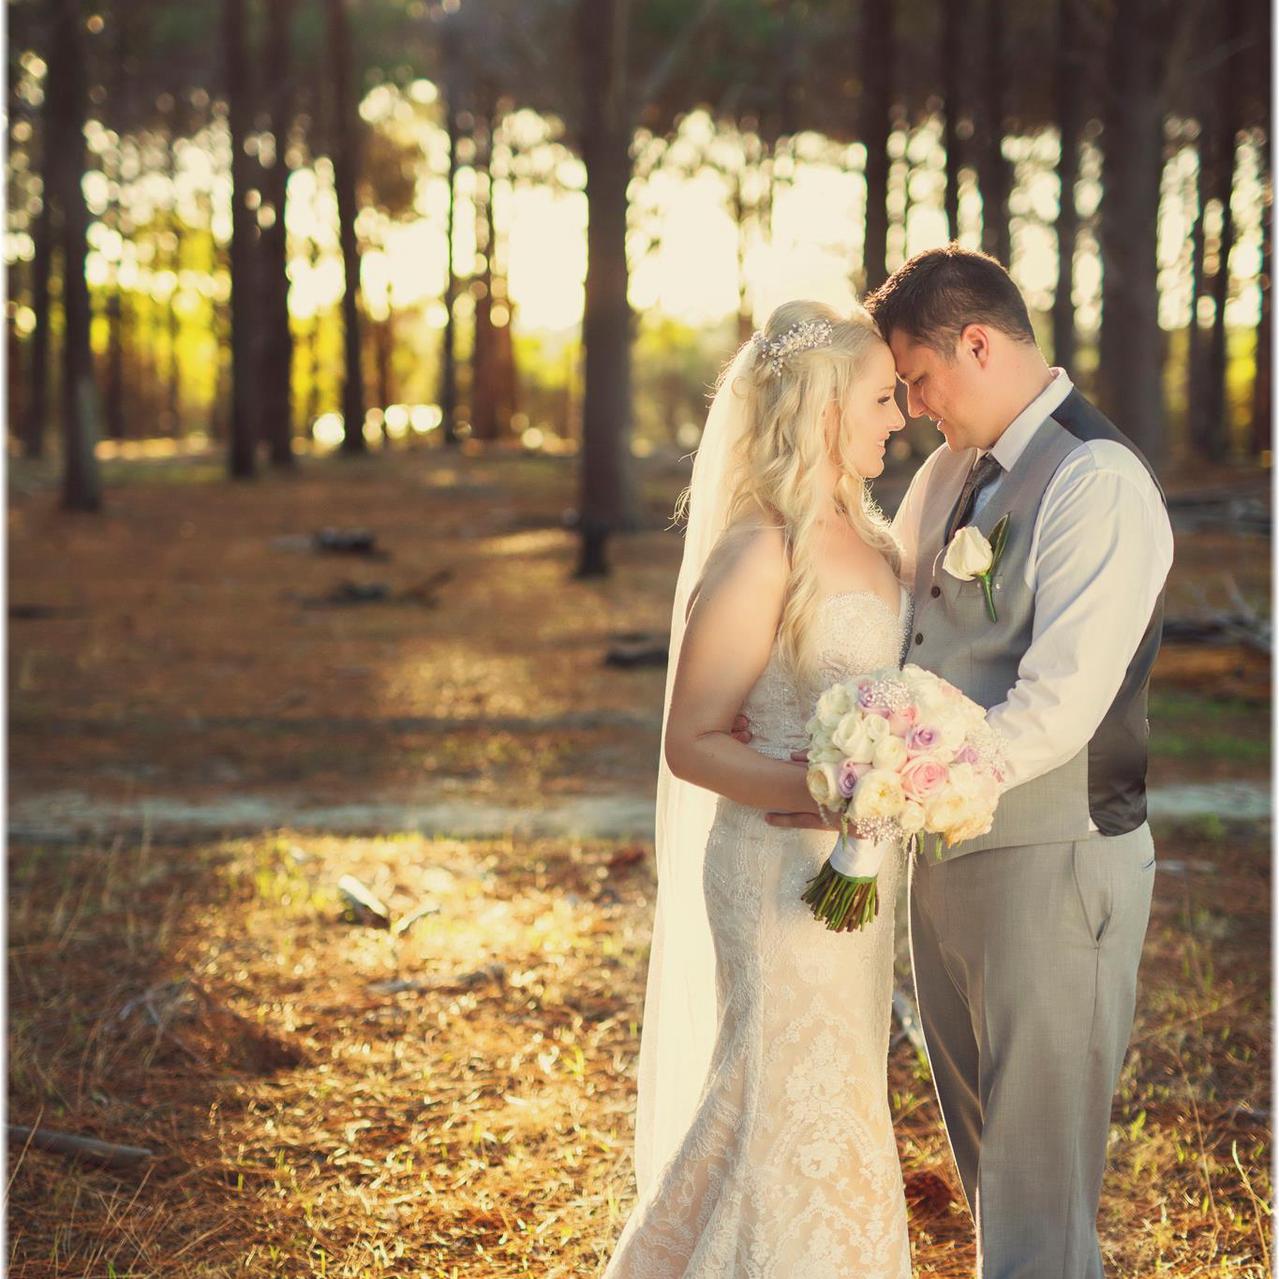 Jade & Adam Perth wedding